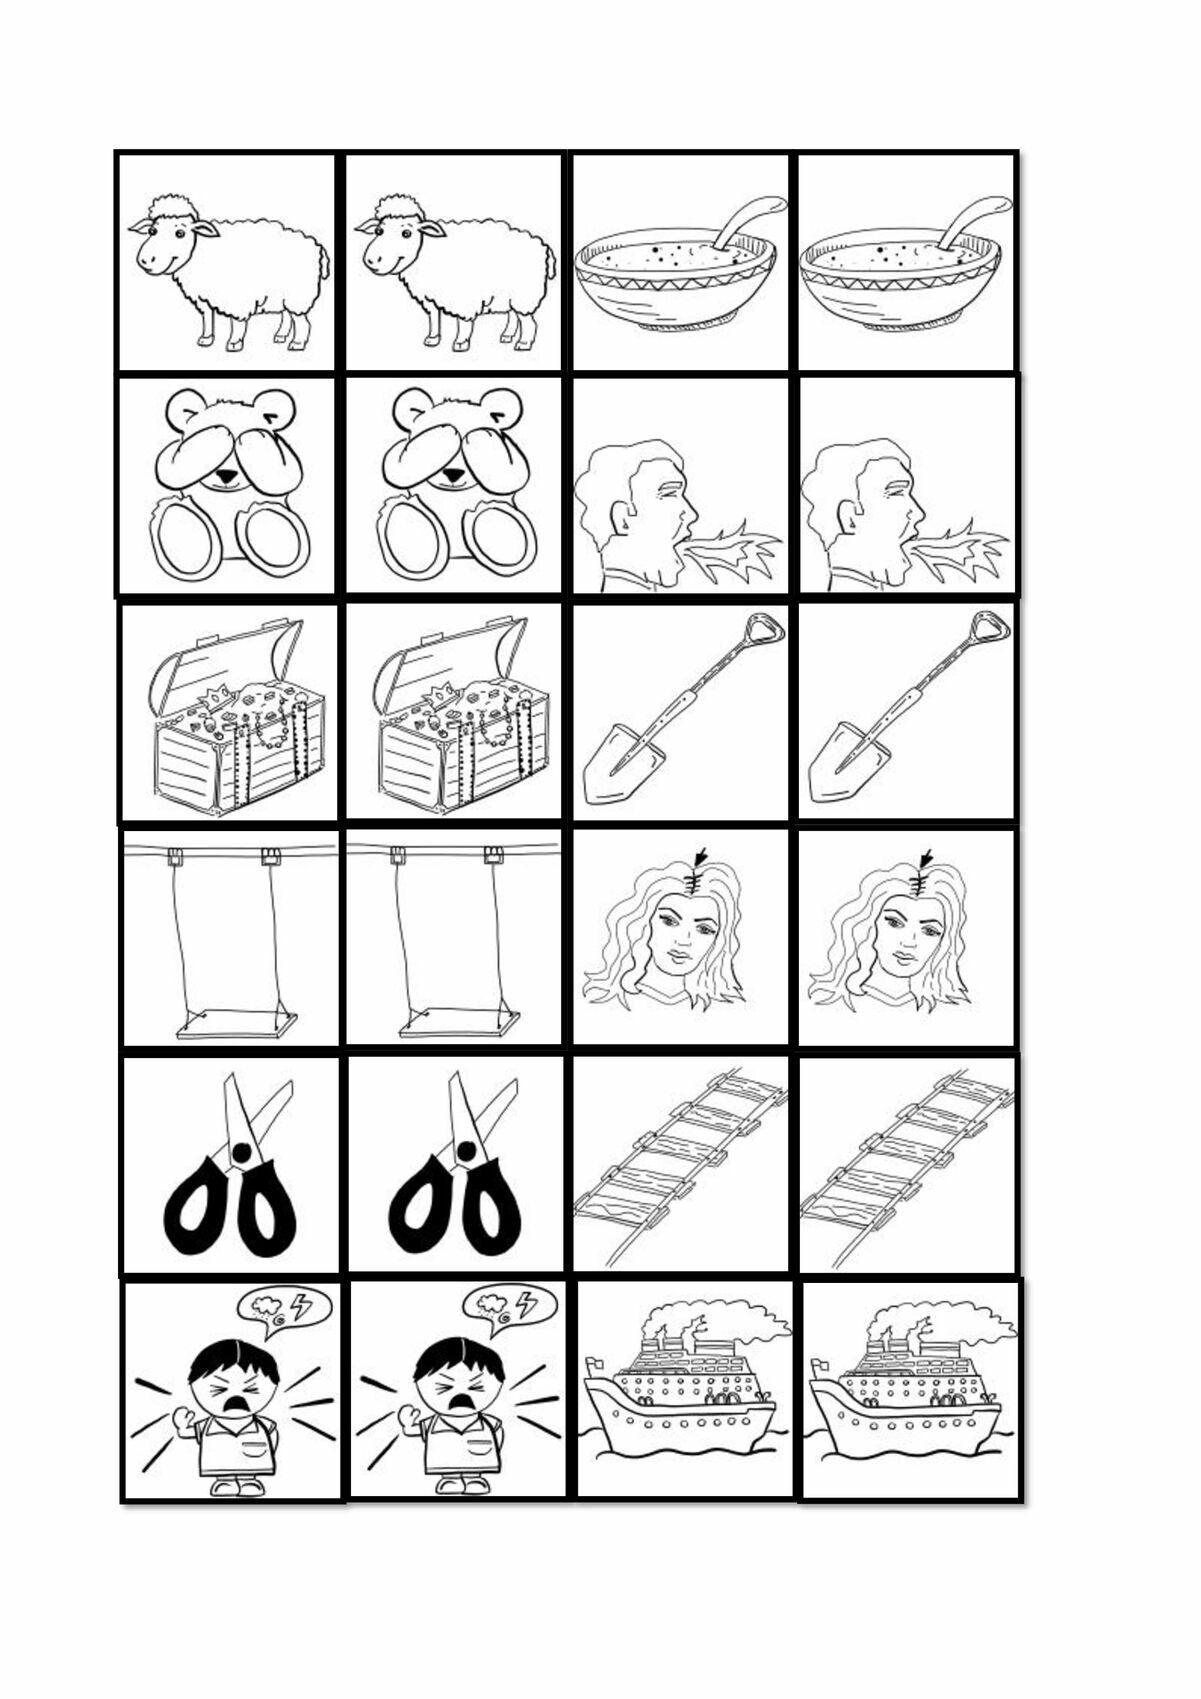 Memo Spiel Ausdrucken Memokarten Abc